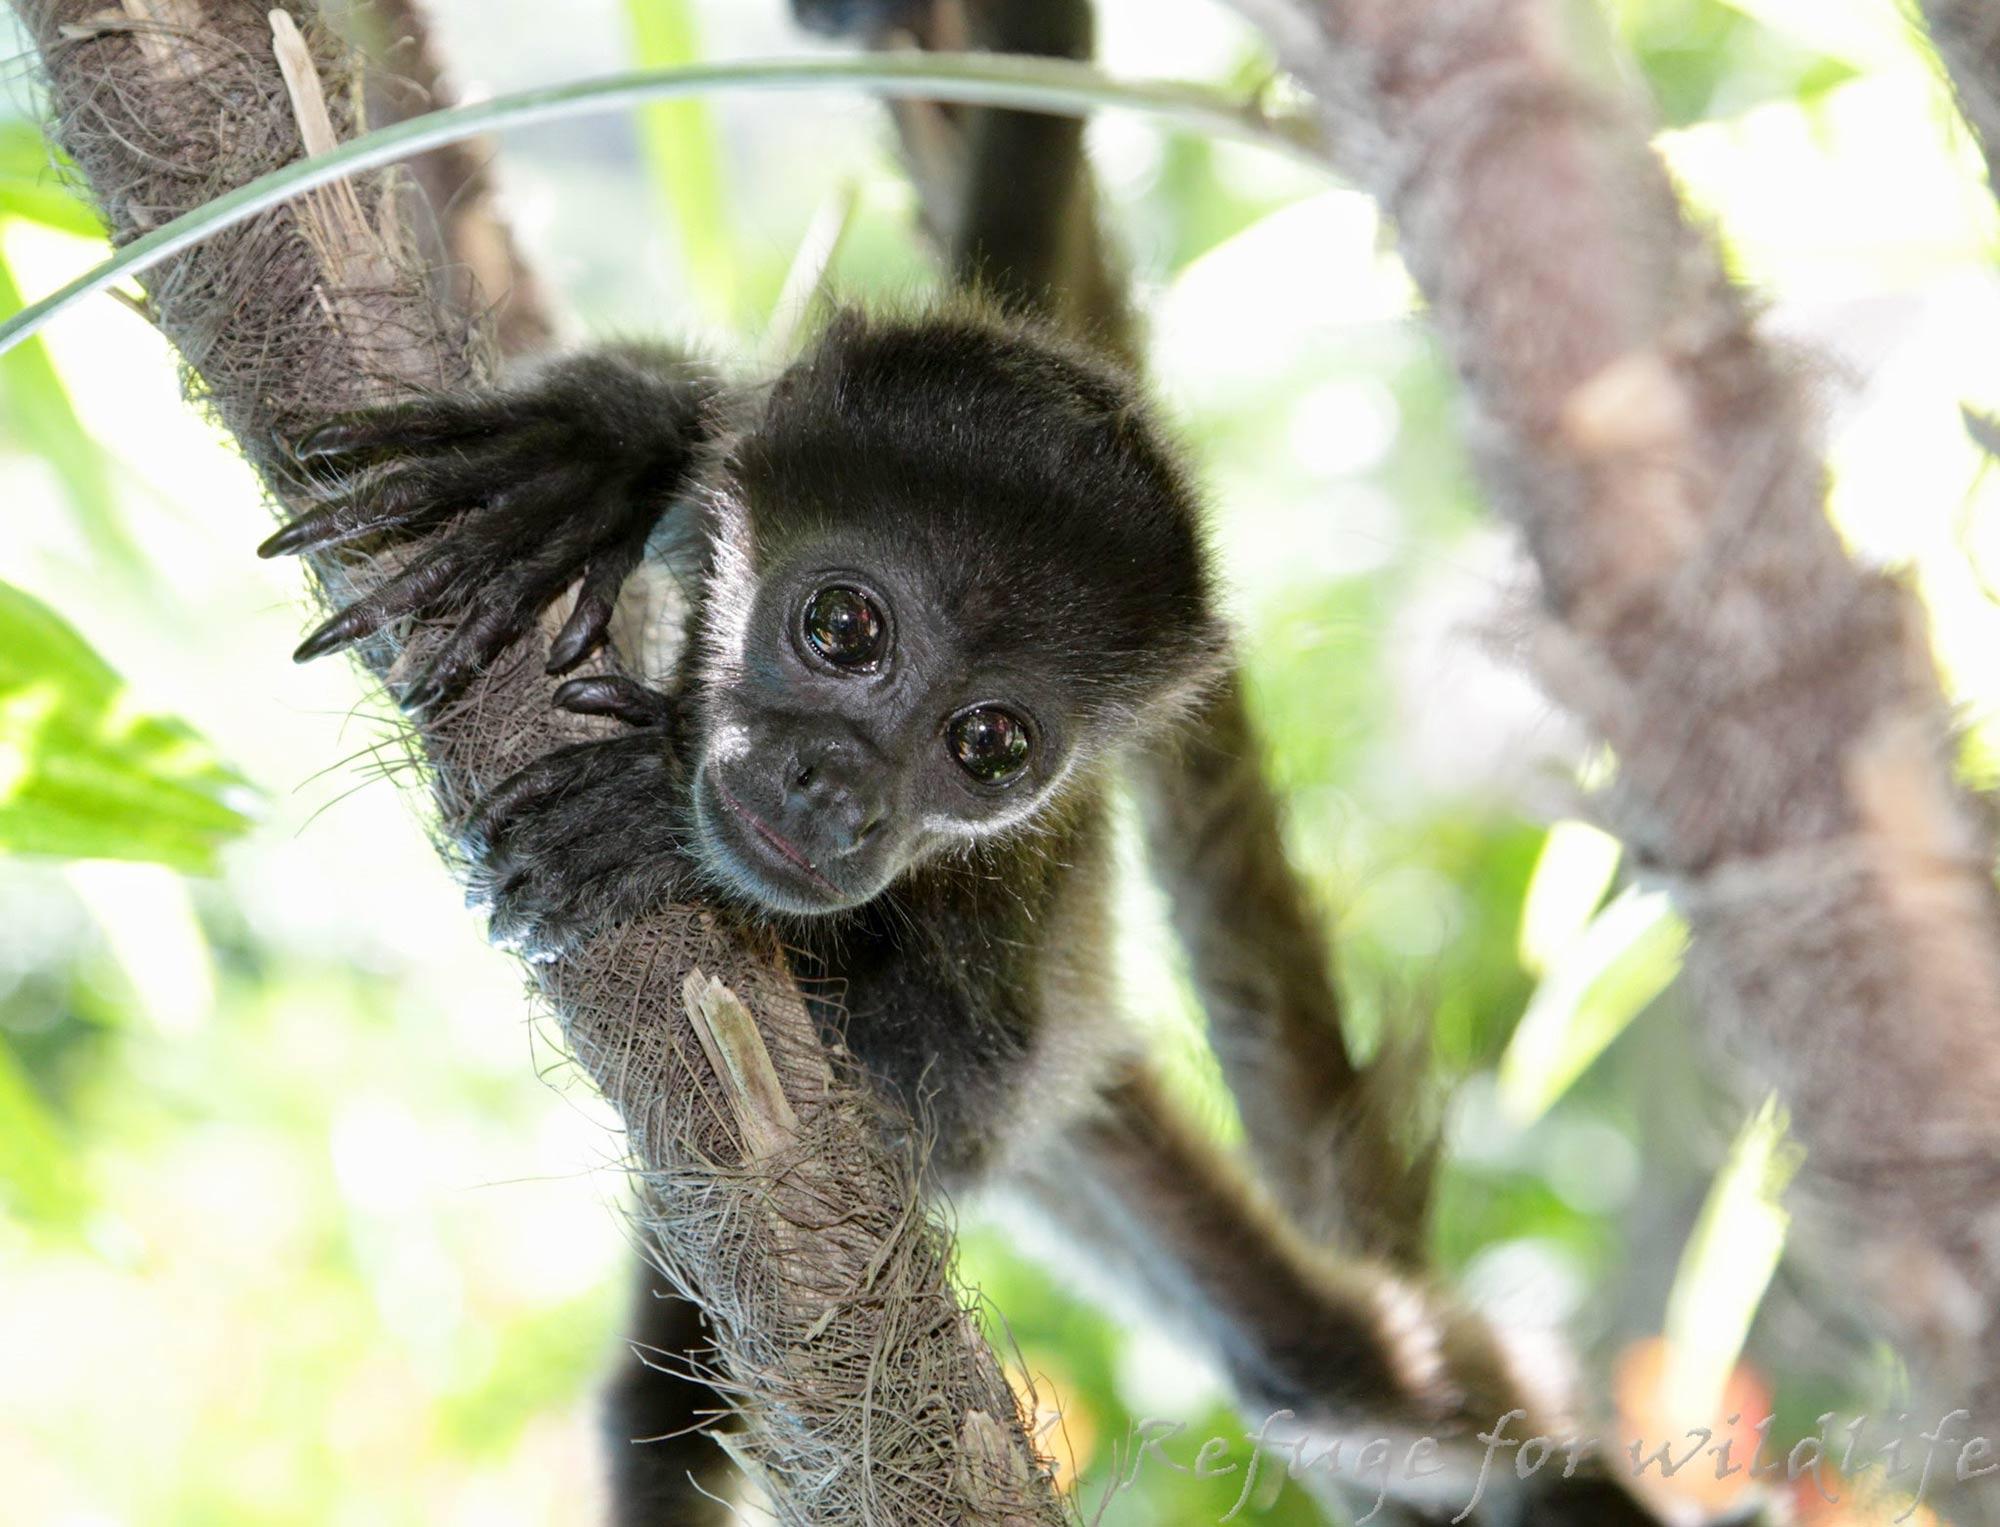 Monkey-Rescue-Nosara-Costa-Rica-1